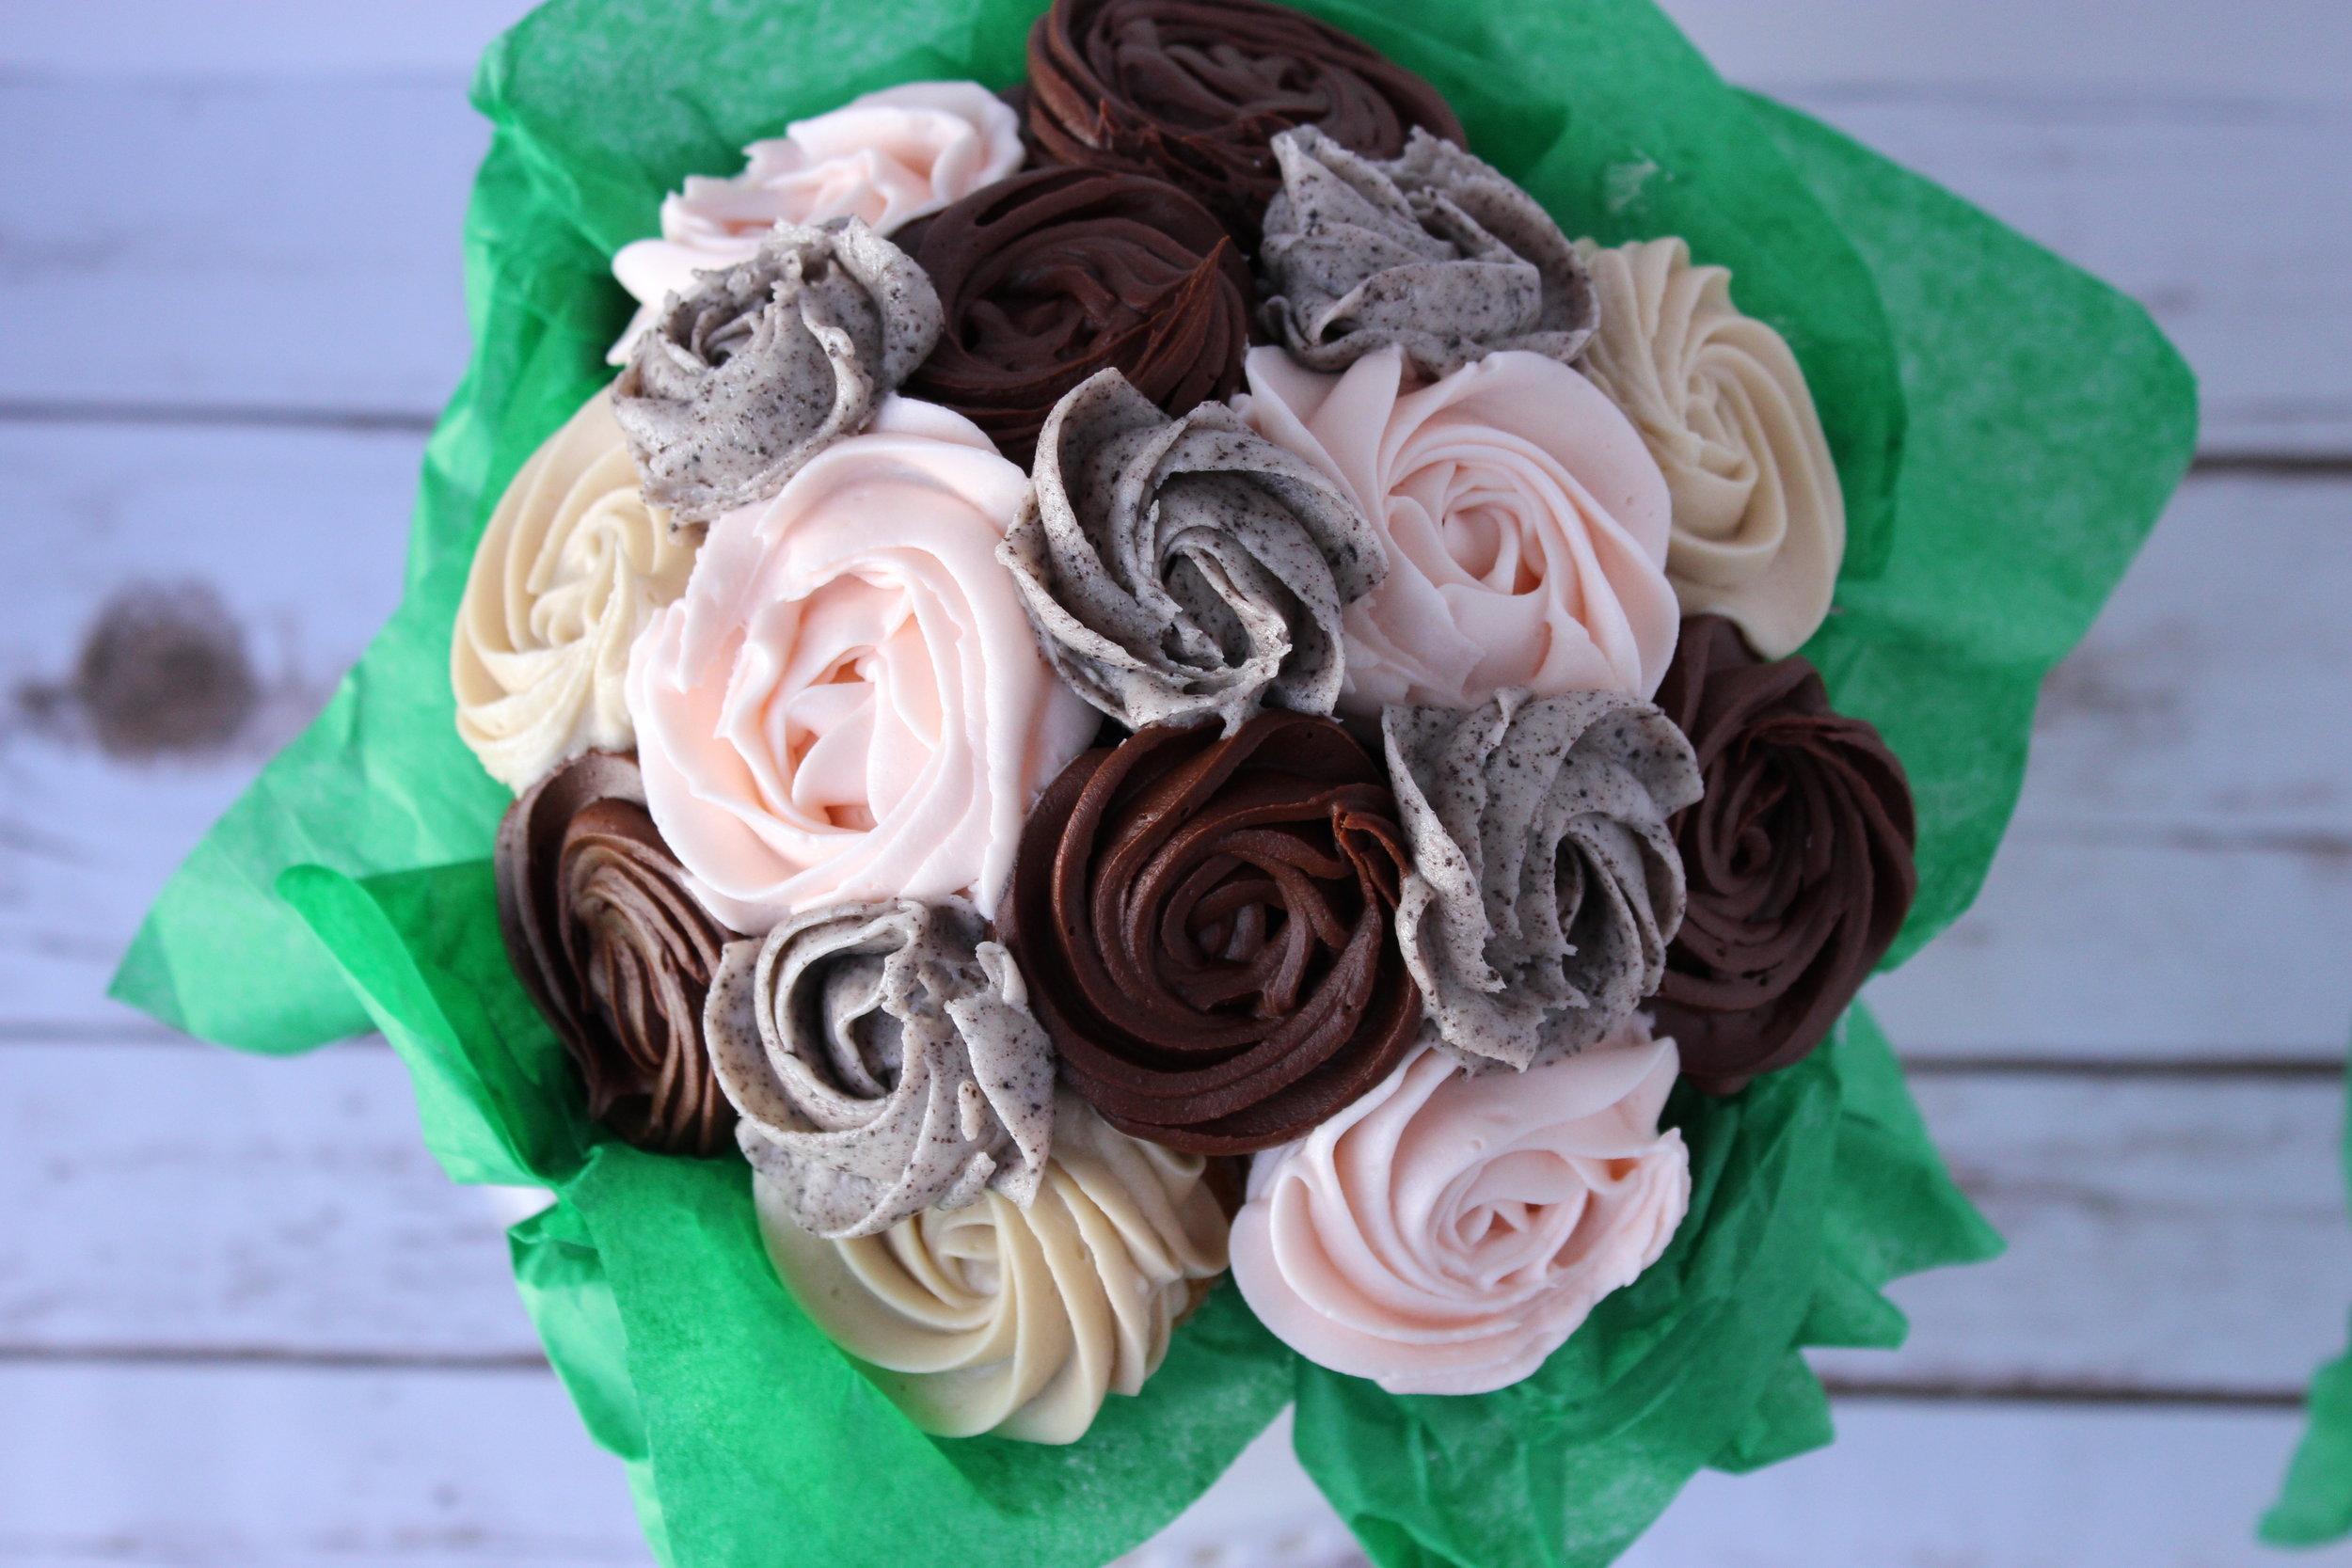 vday bouquet.JPG